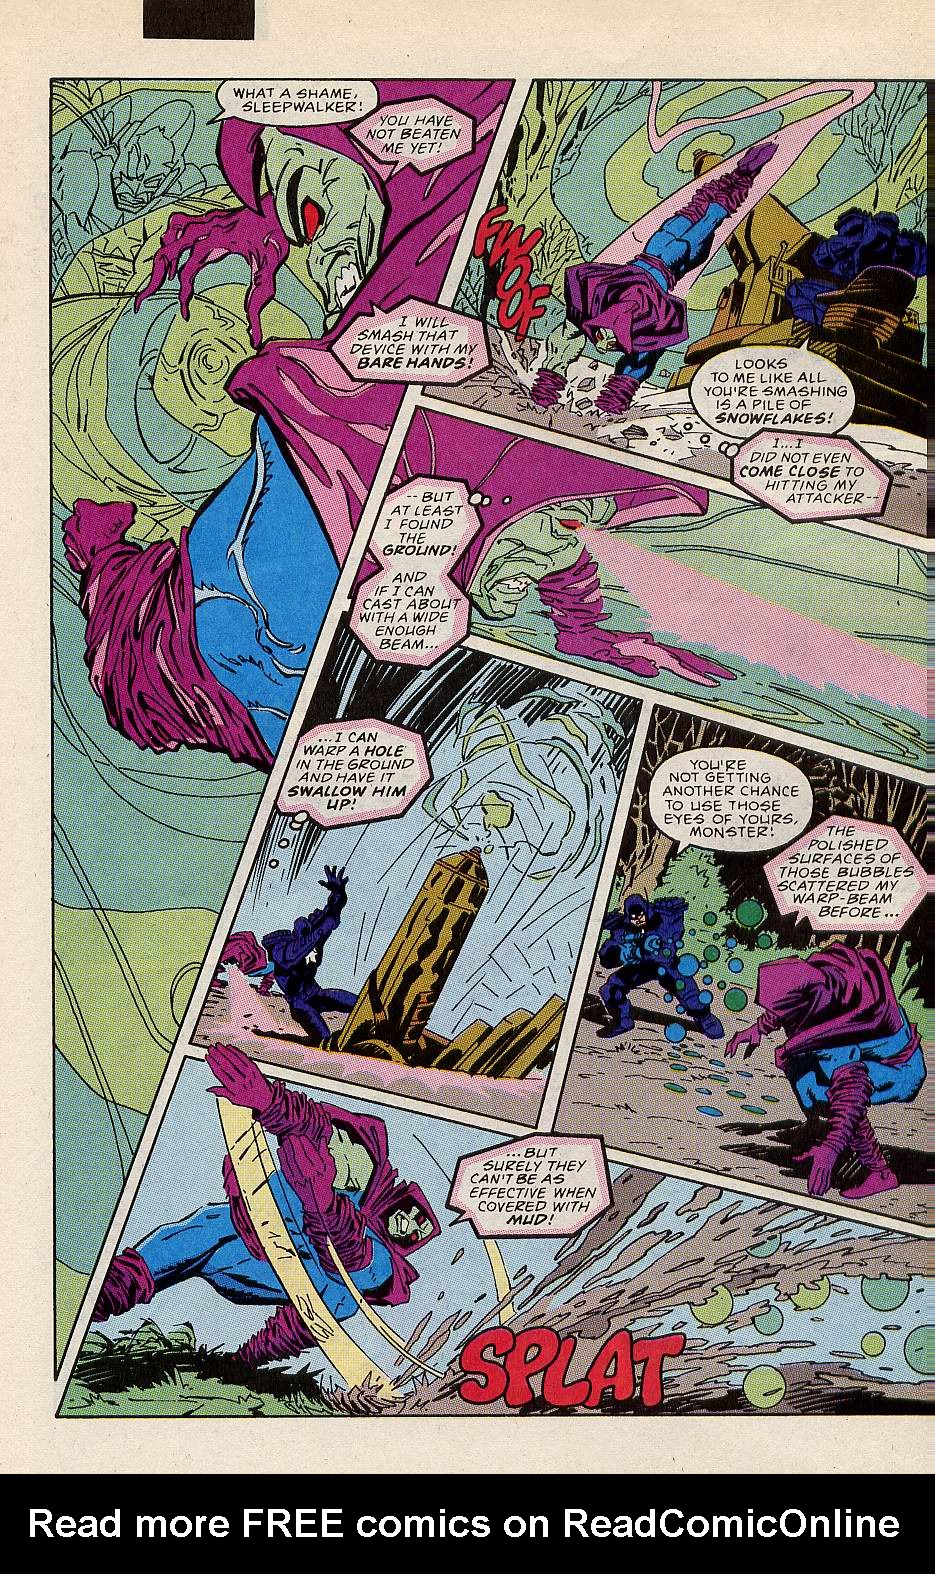 Read online Sleepwalker comic -  Issue #10 - 19